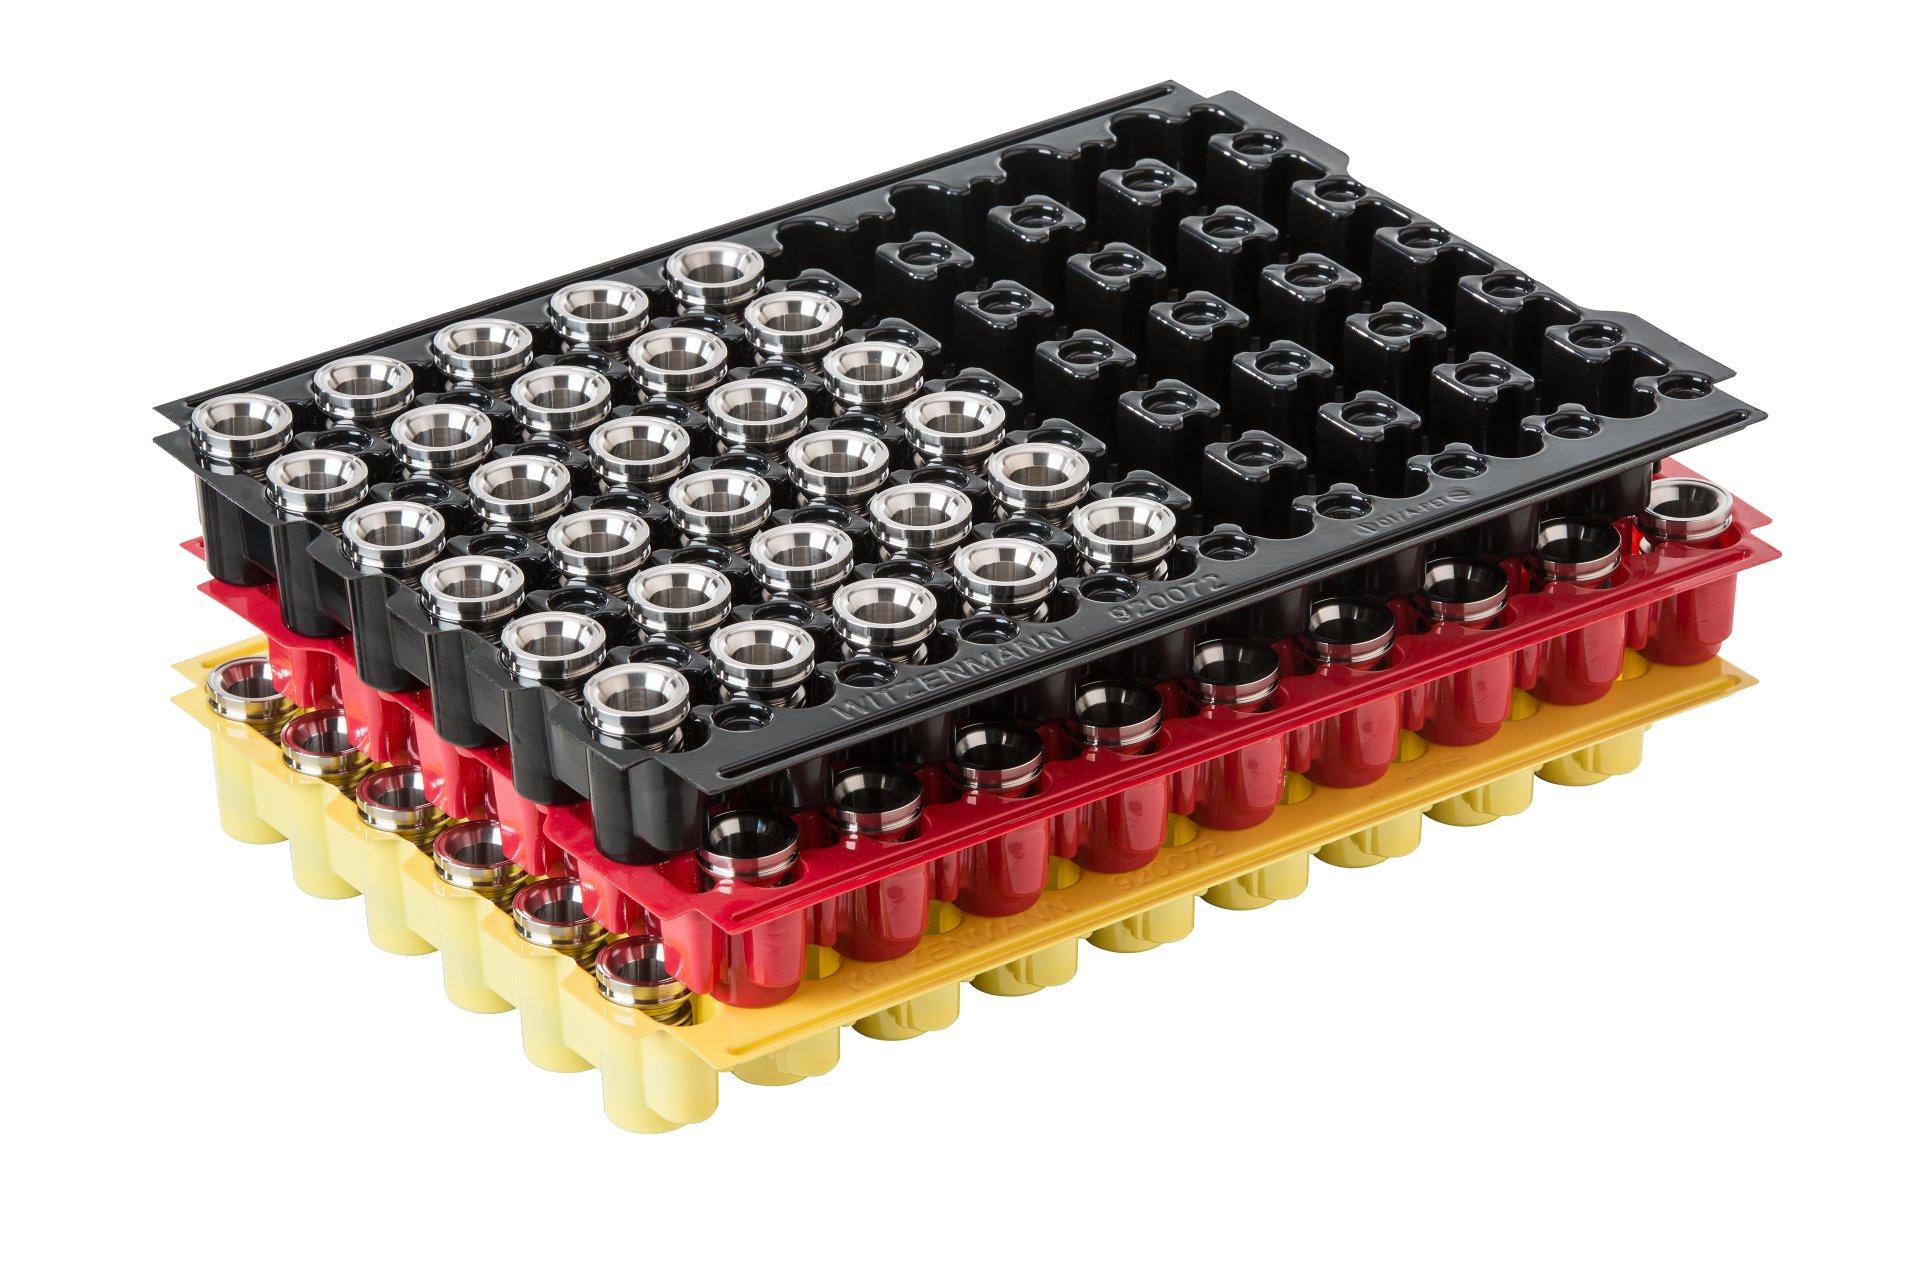 Kunststoff-Formteile für vollintegrierte Fahrzeuge